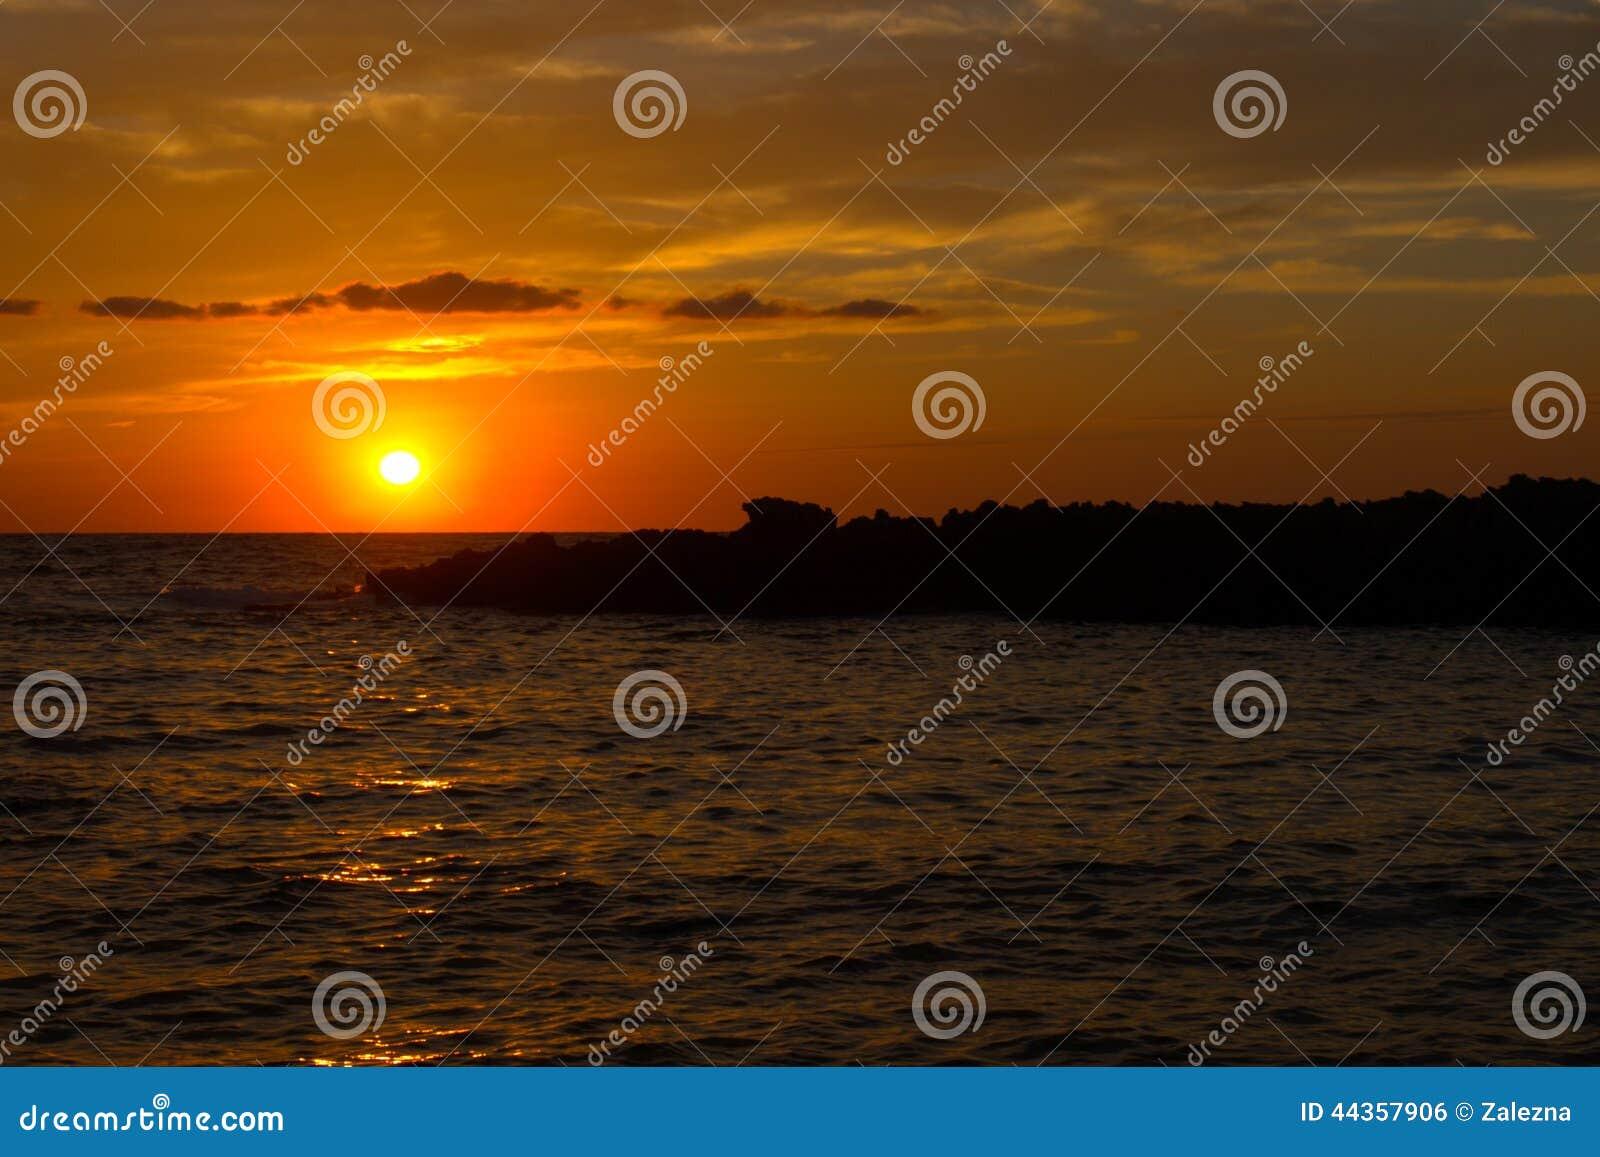 Sunset on Sicily